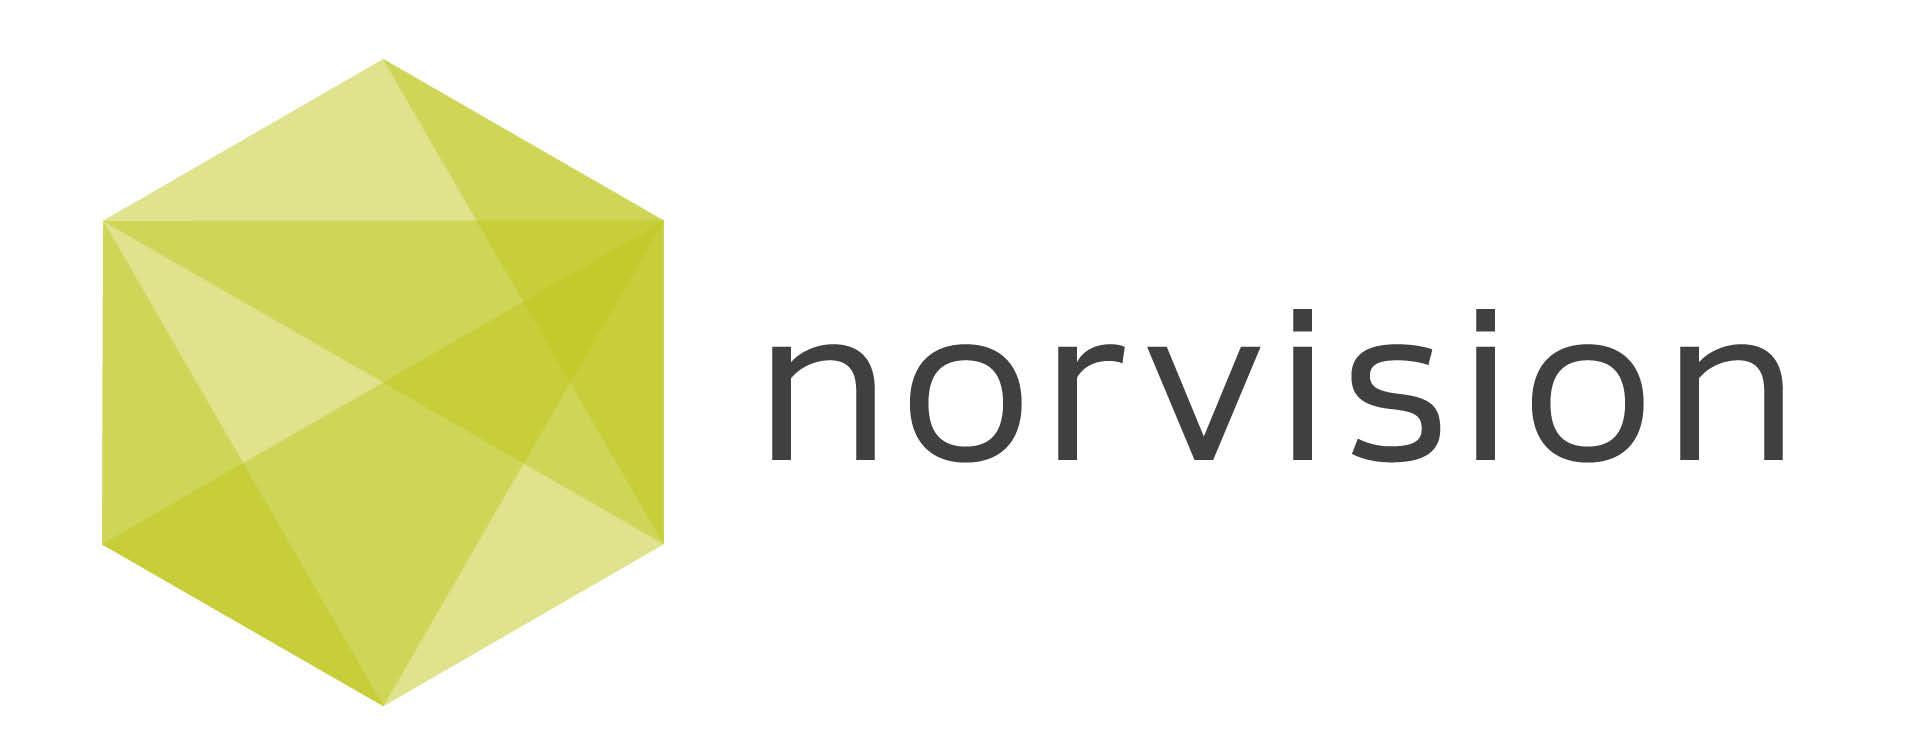 norvision-logo